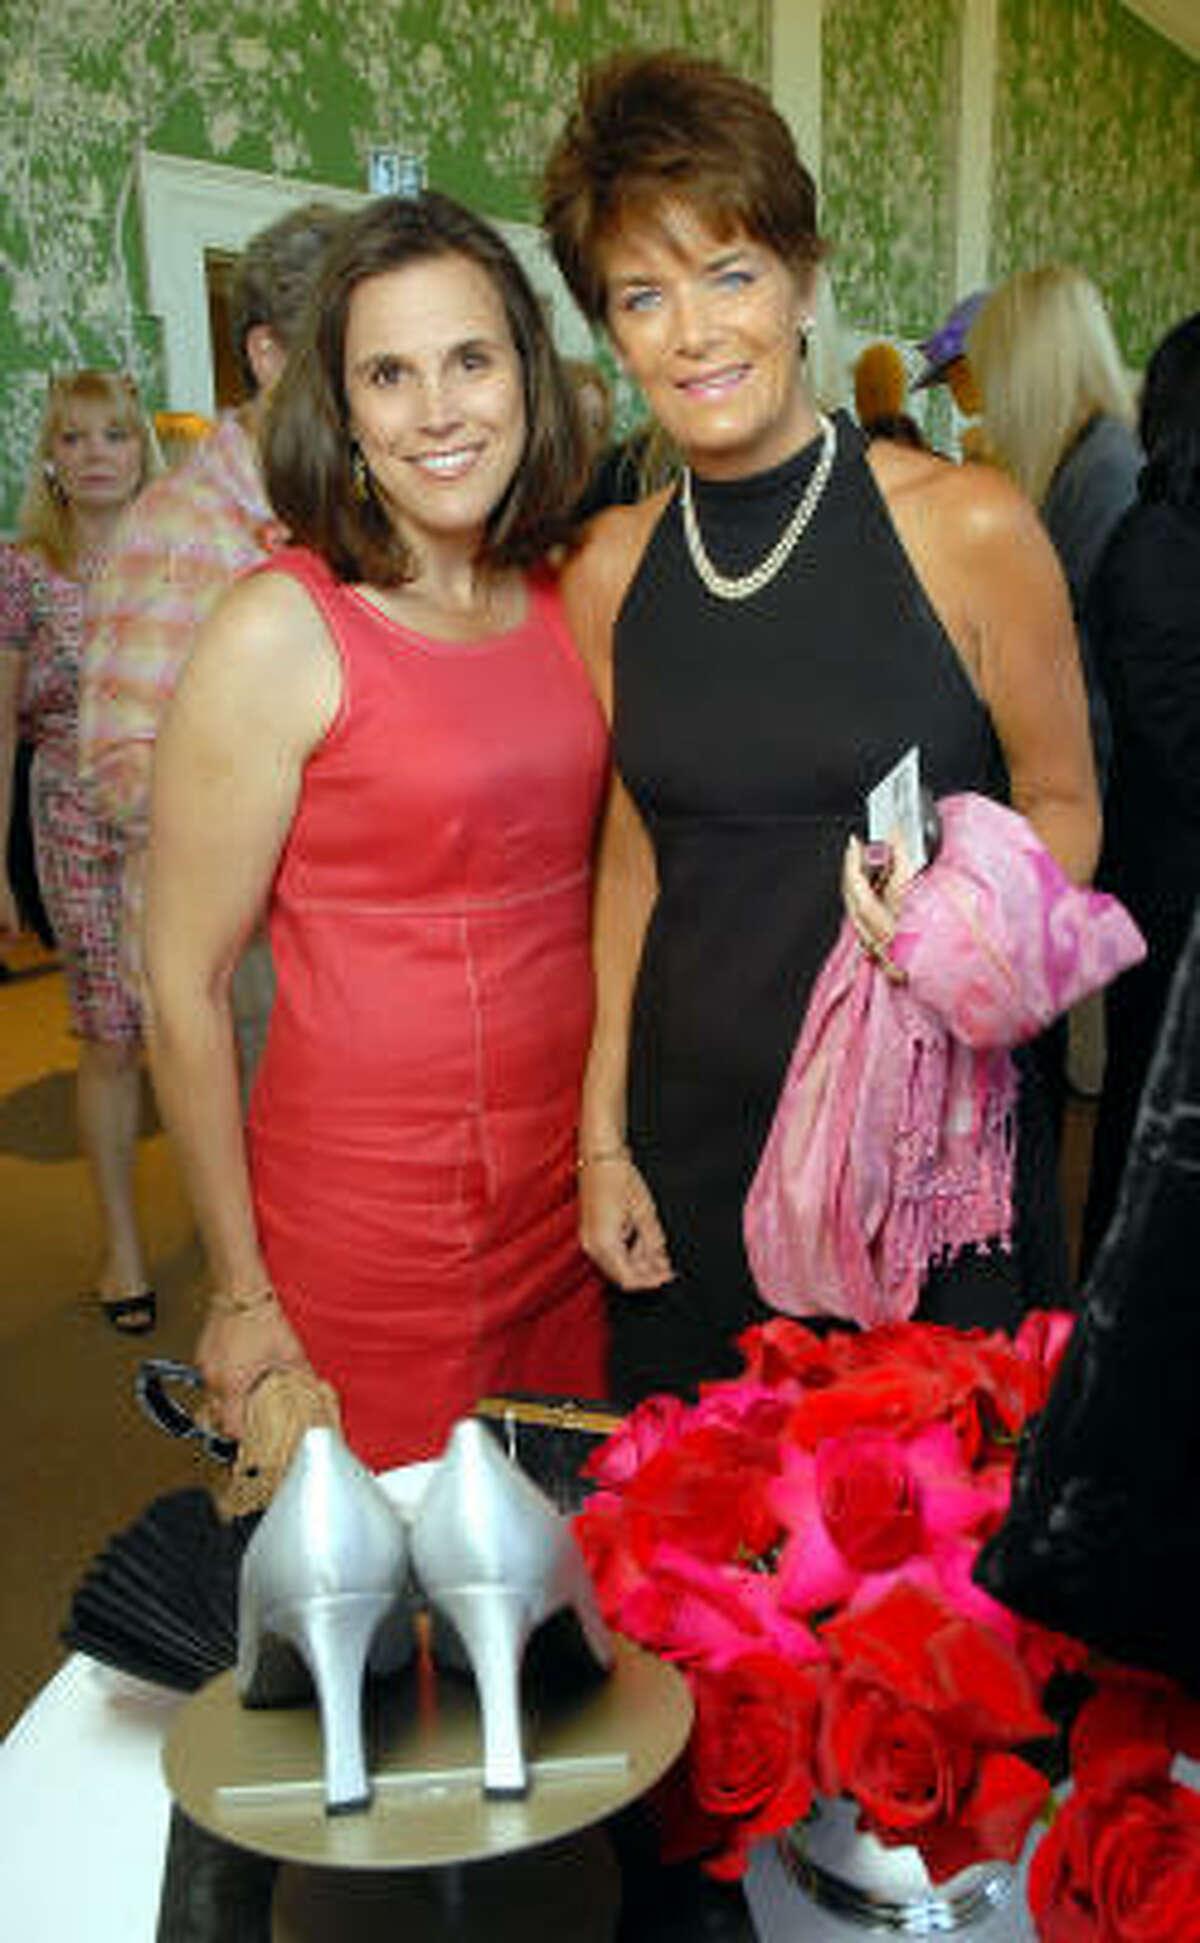 Beth Black and Nancy Smidt